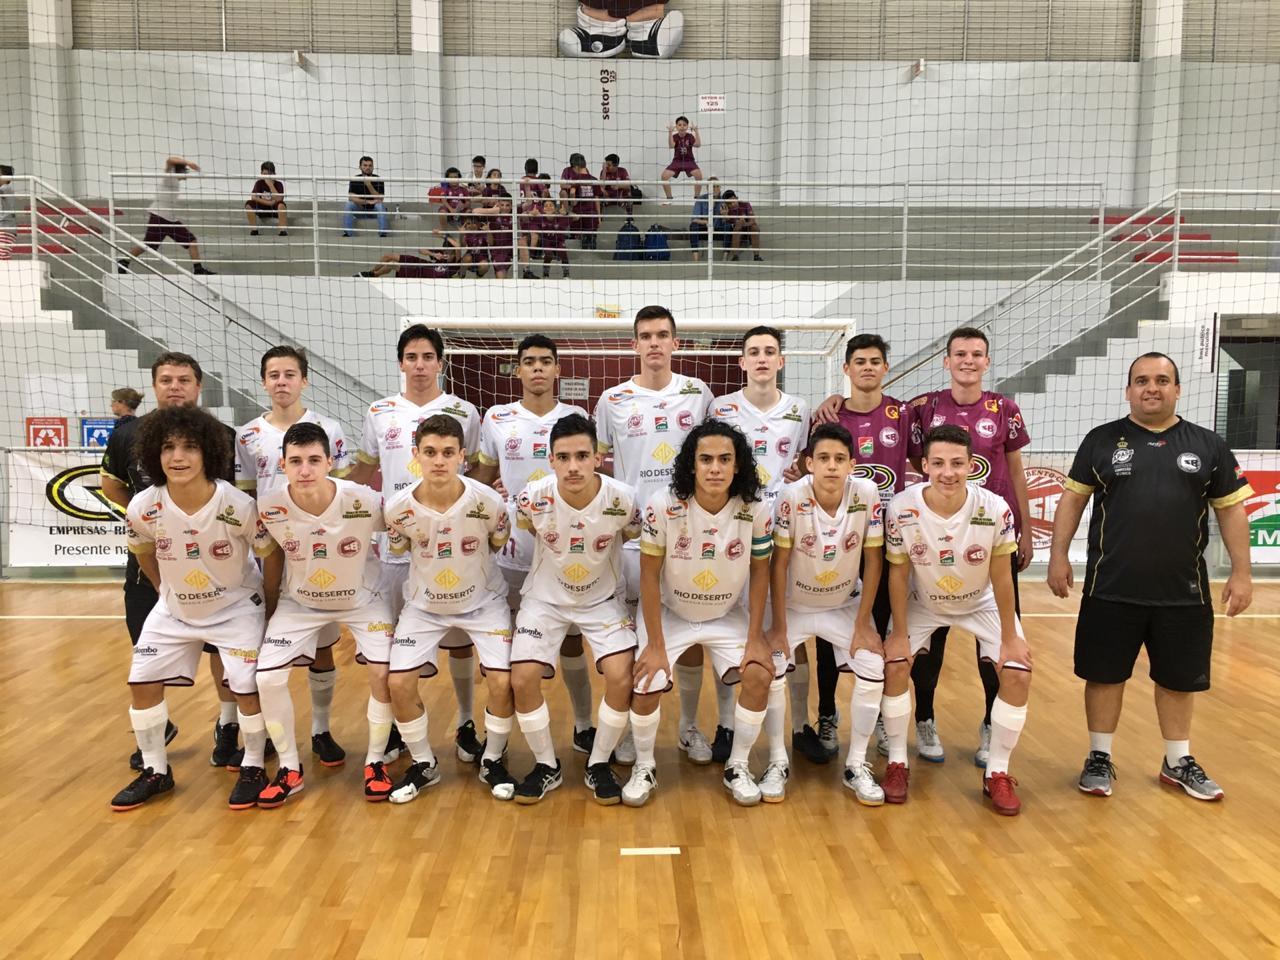 Prefeitura Municipal de Criciúma - Criciúma conquista segunda vitória consecutiva no Estadual de Futsal Sub-17